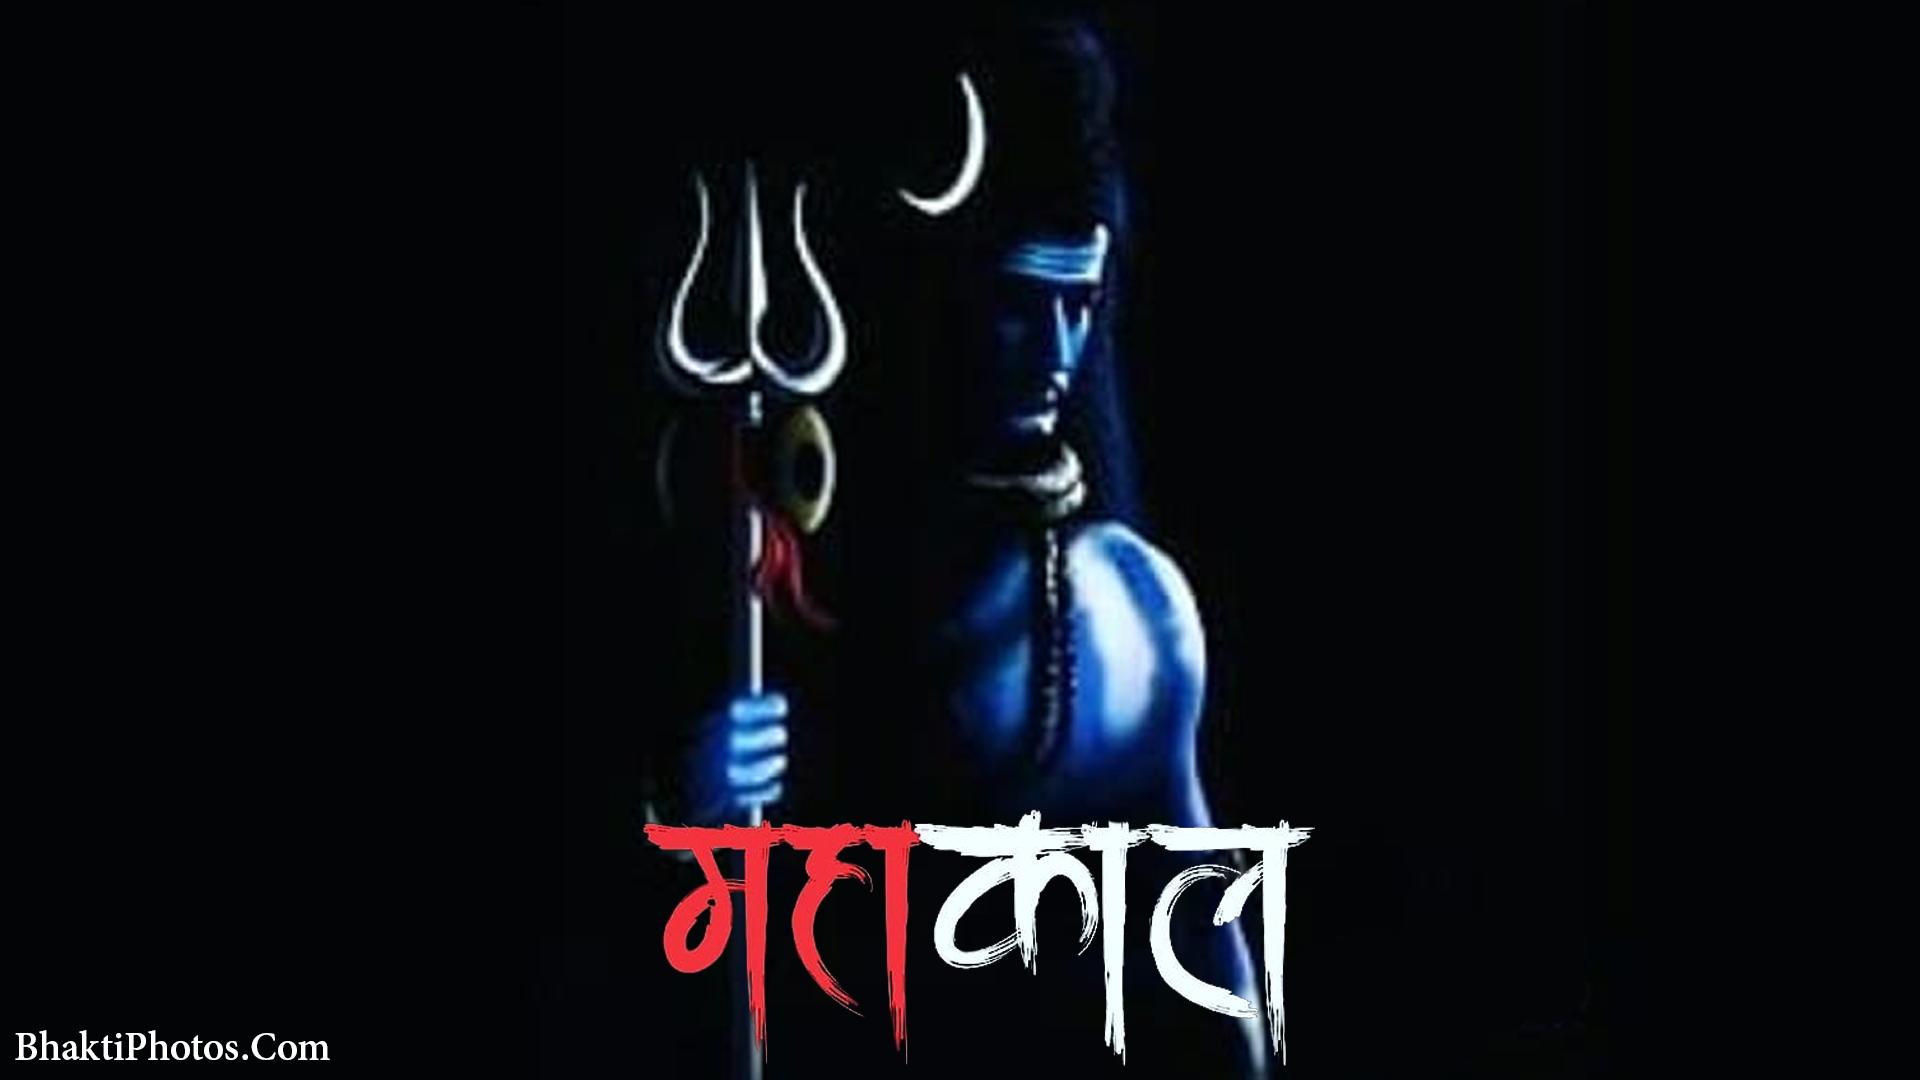 28 जय श र मह क ल images jai mahakal photo jai mahakal wallpaper jai mahakal image bhakti photos bhakti photos